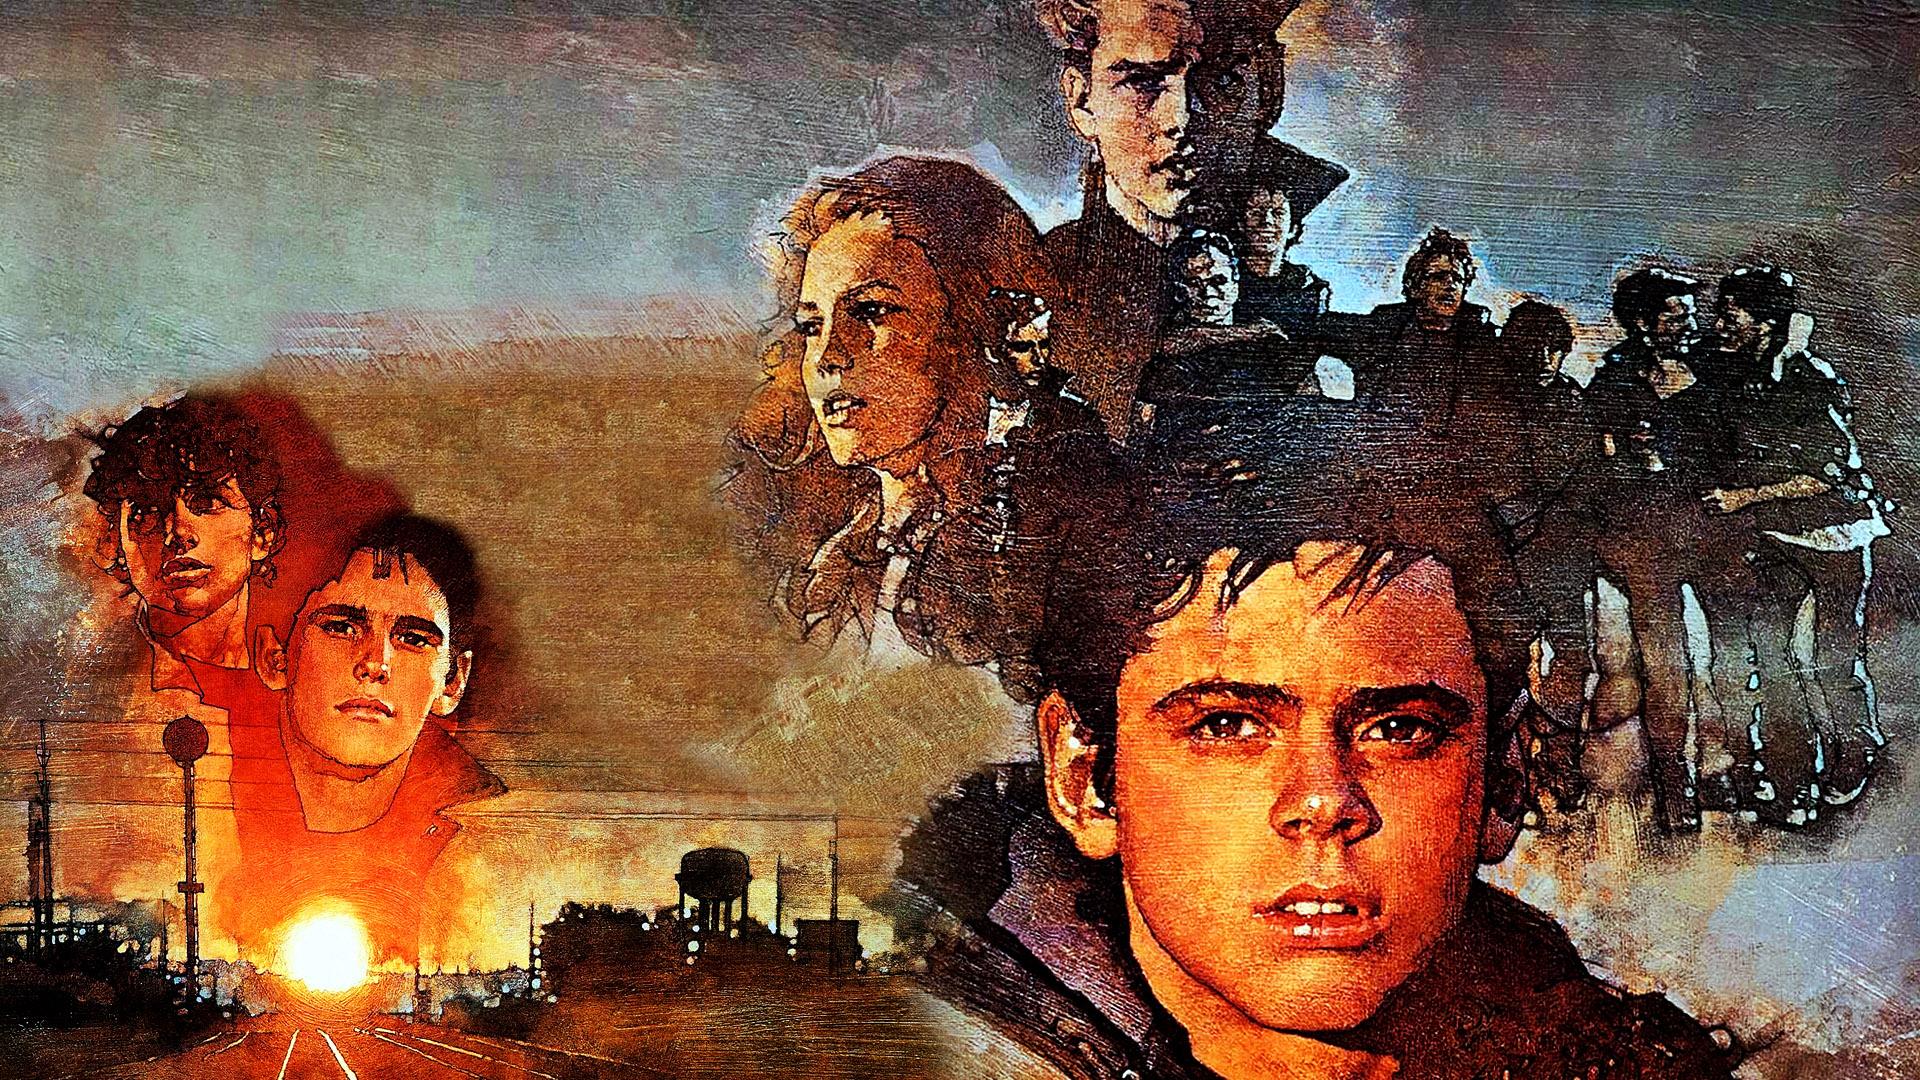 Movie Fanart: The Outsiders